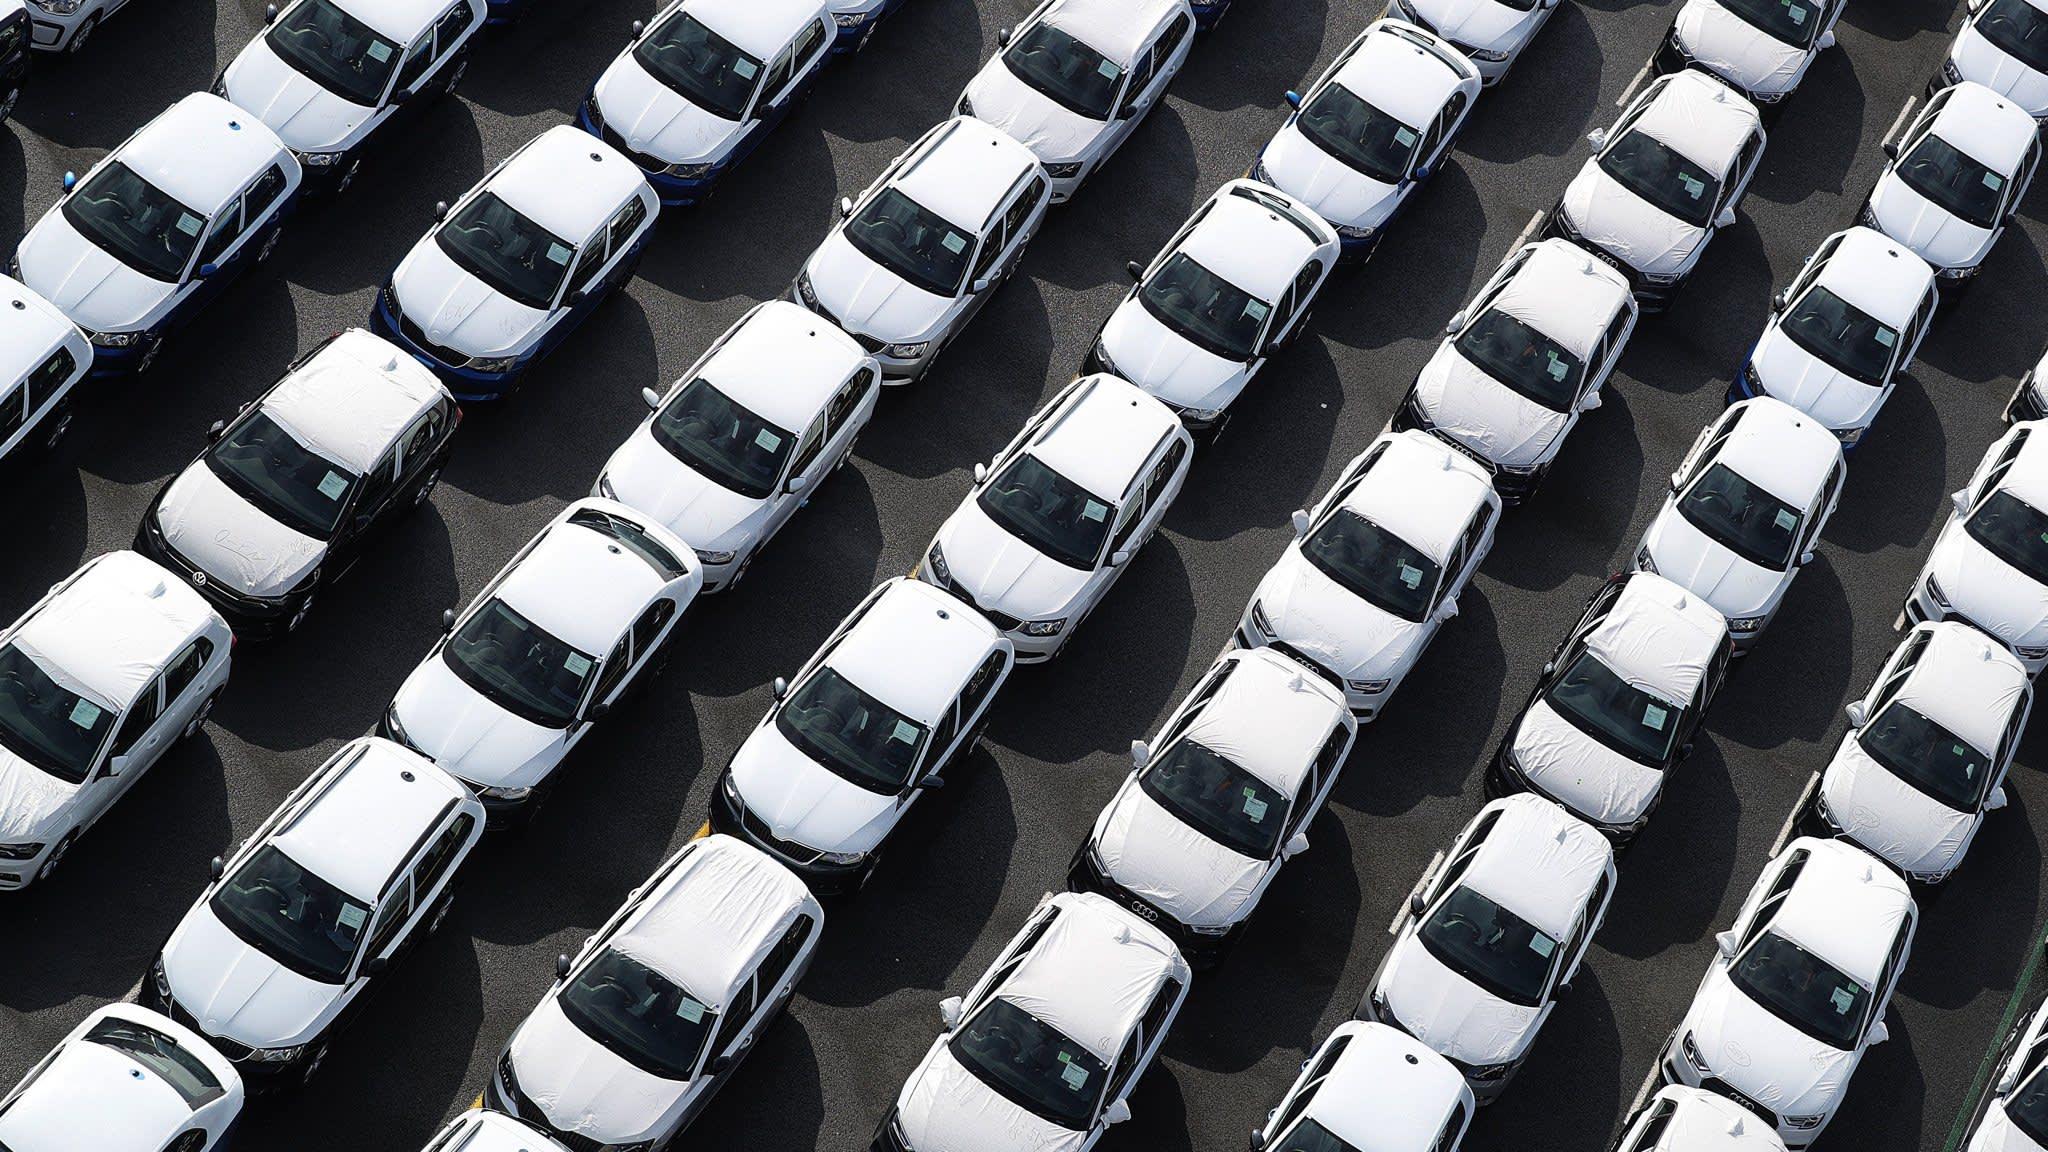 EU probes BMW, Daimler and VW over possible cartel behaviour